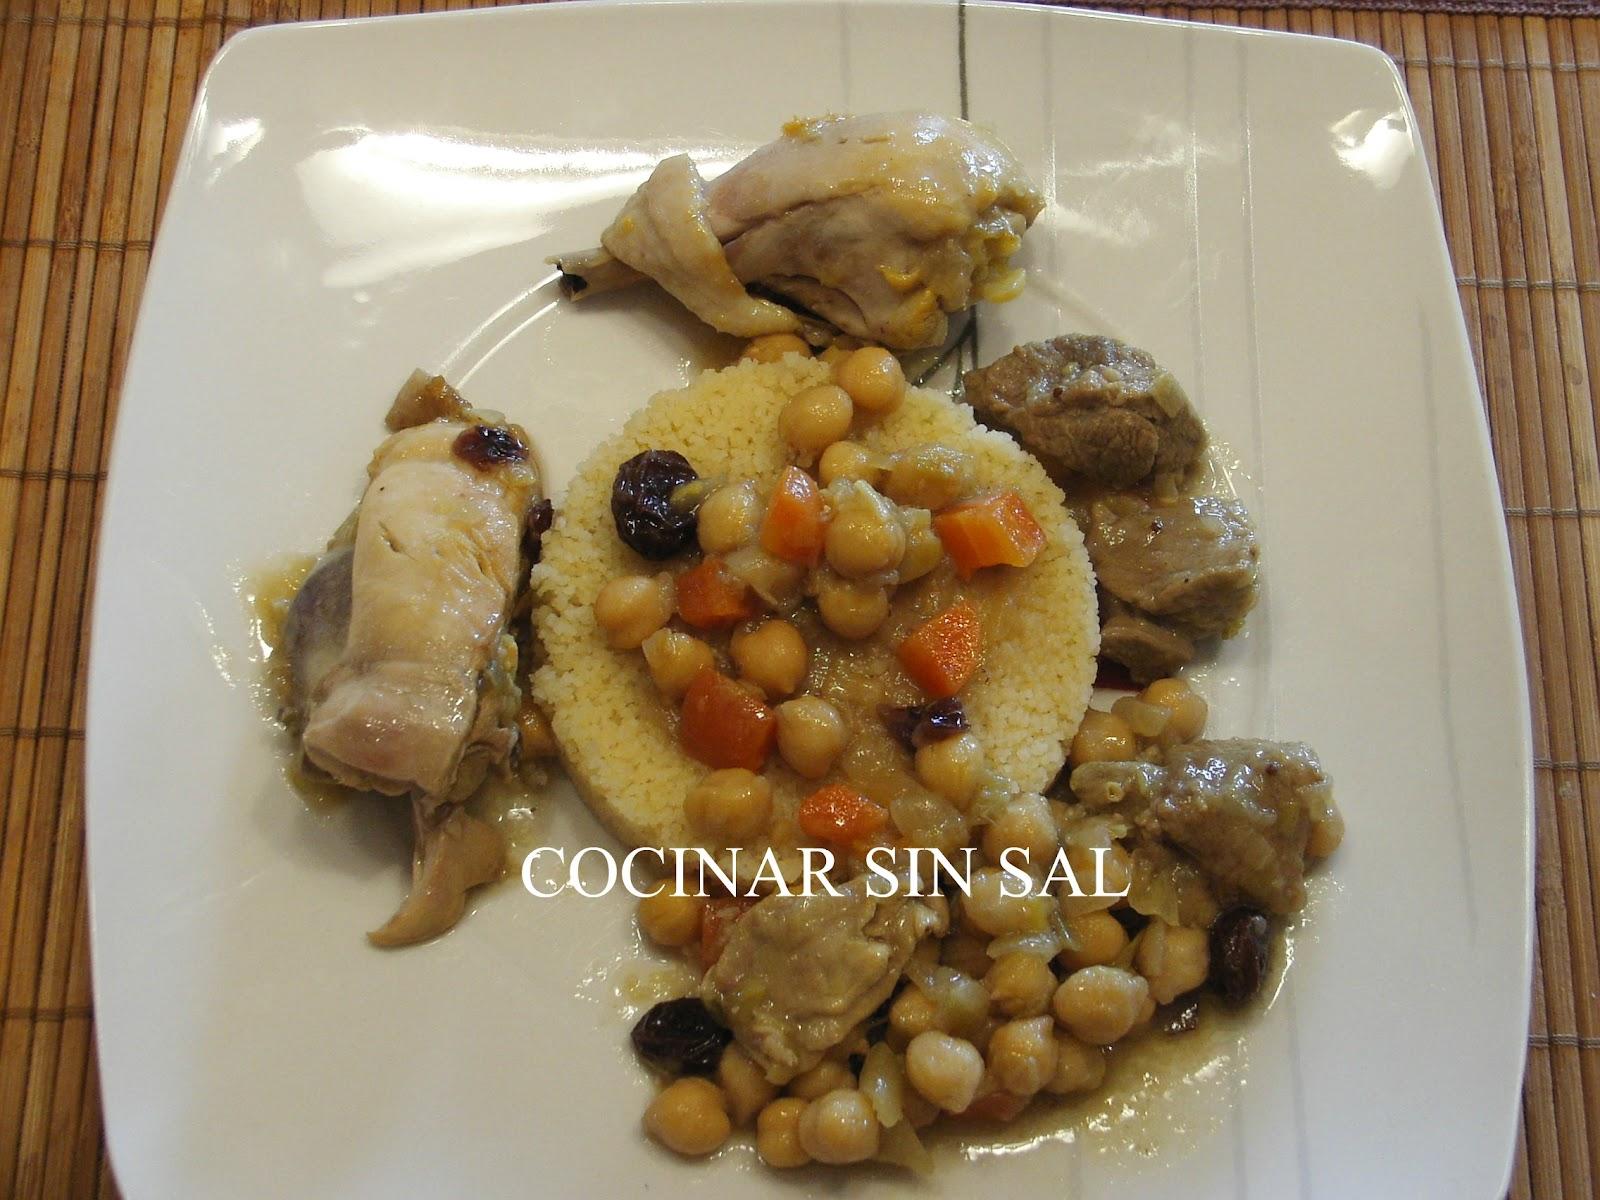 Cocinar sin sal couscous marroqui sin sal - Cocinar sin sal ...